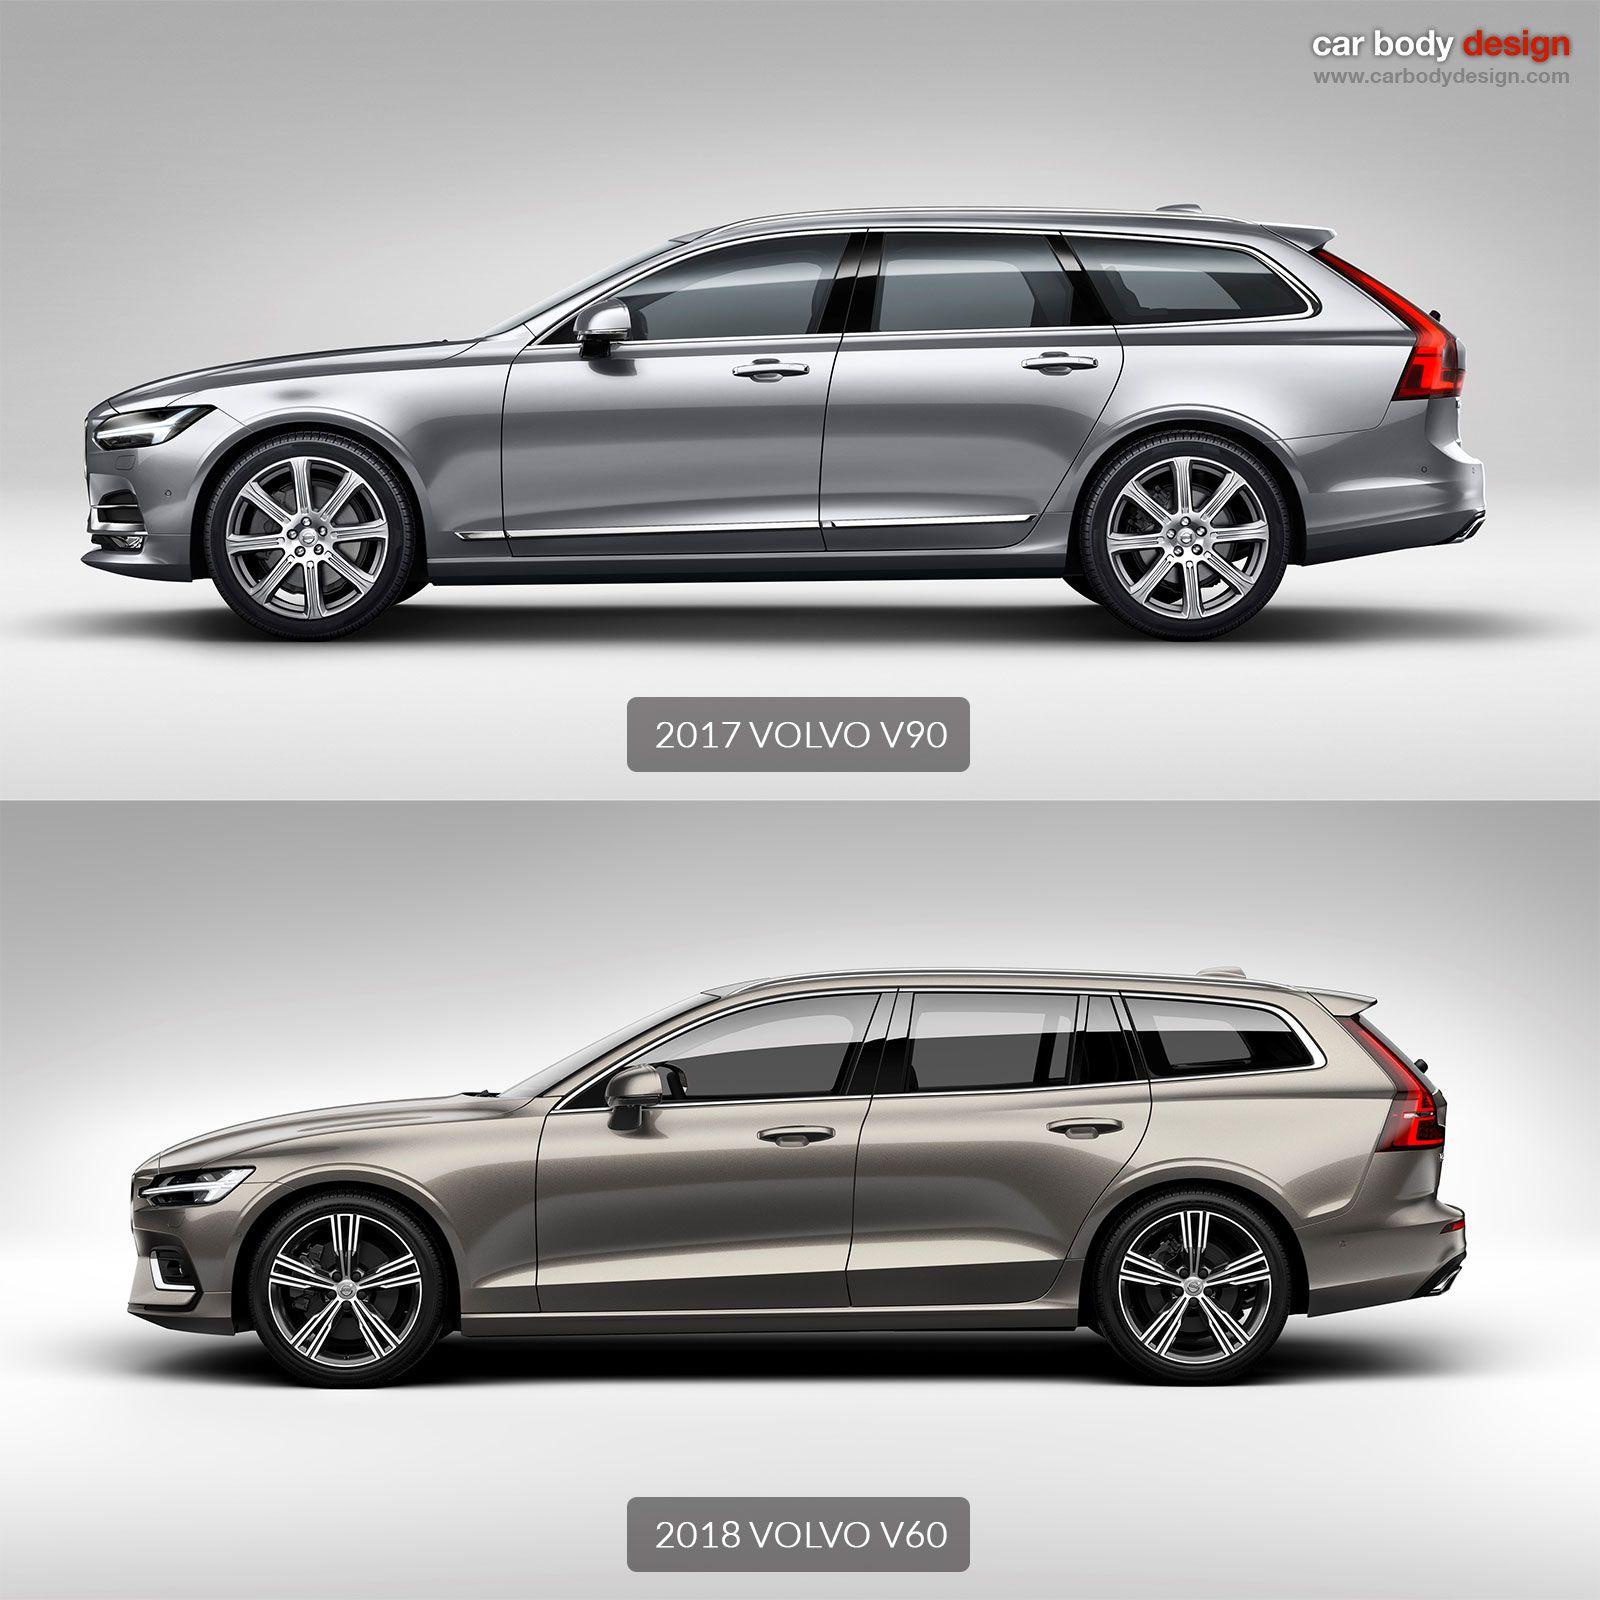 2017 Volvo V90 Vs 2018 Volvo V60 Design Comparison